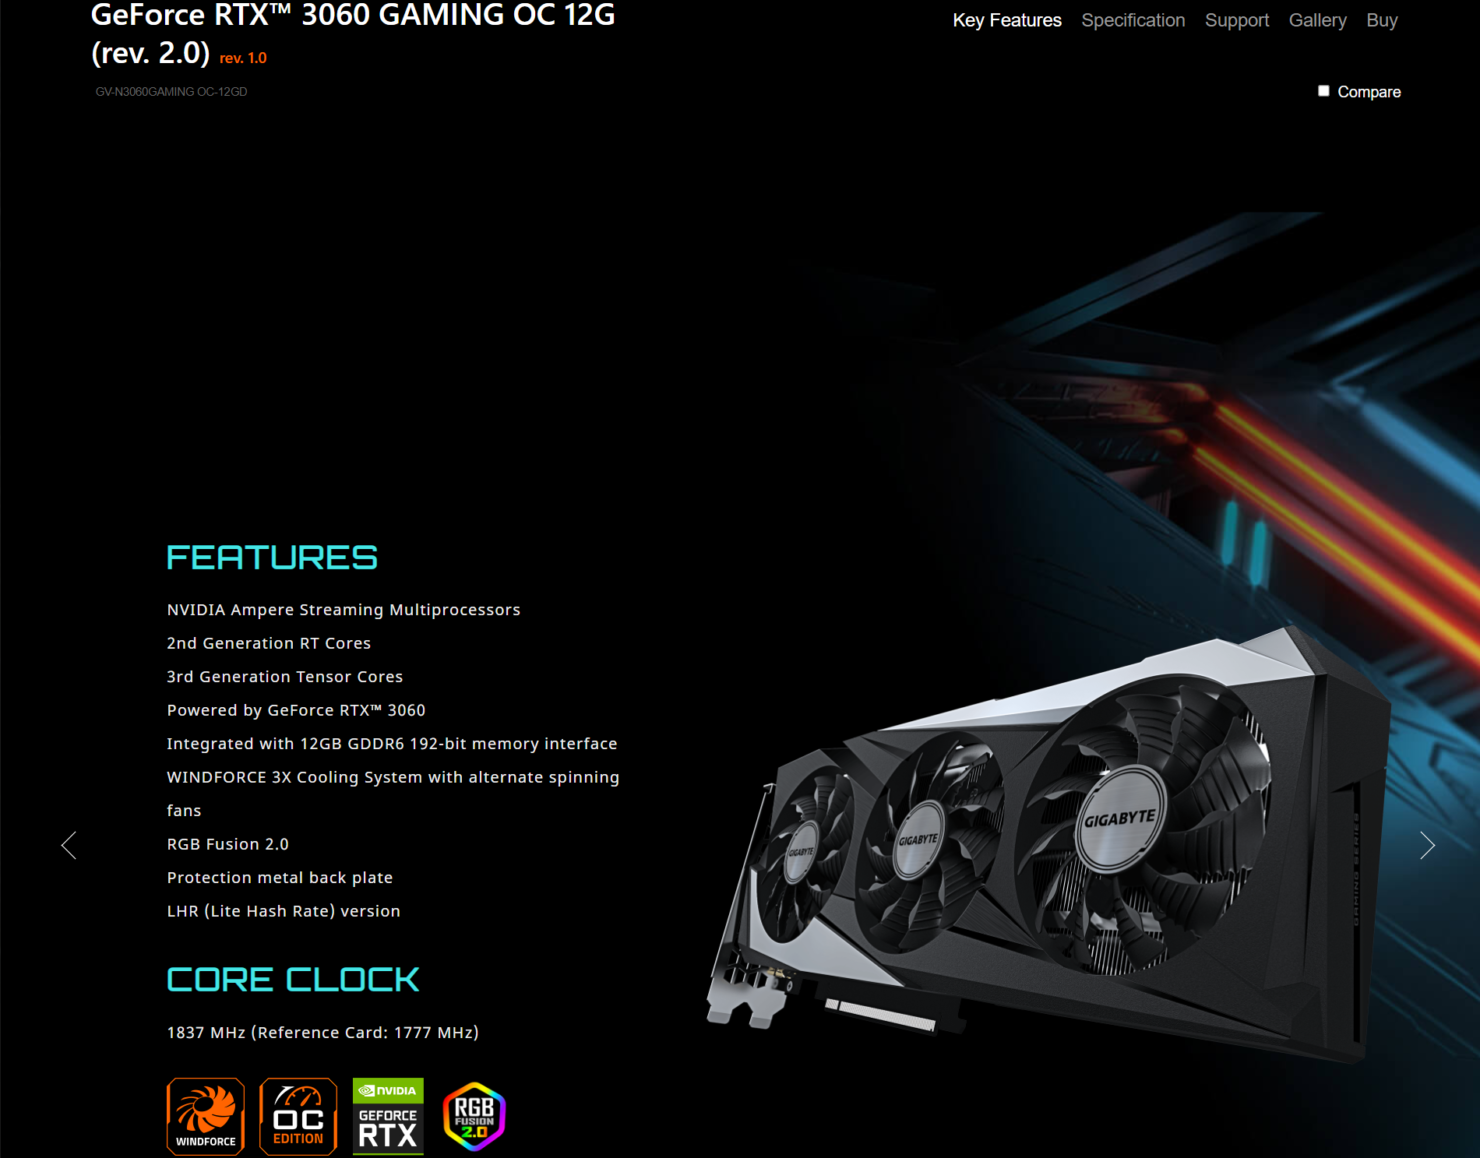 gigabyte-geforce-rtx-3060-gaming-oc-lhr